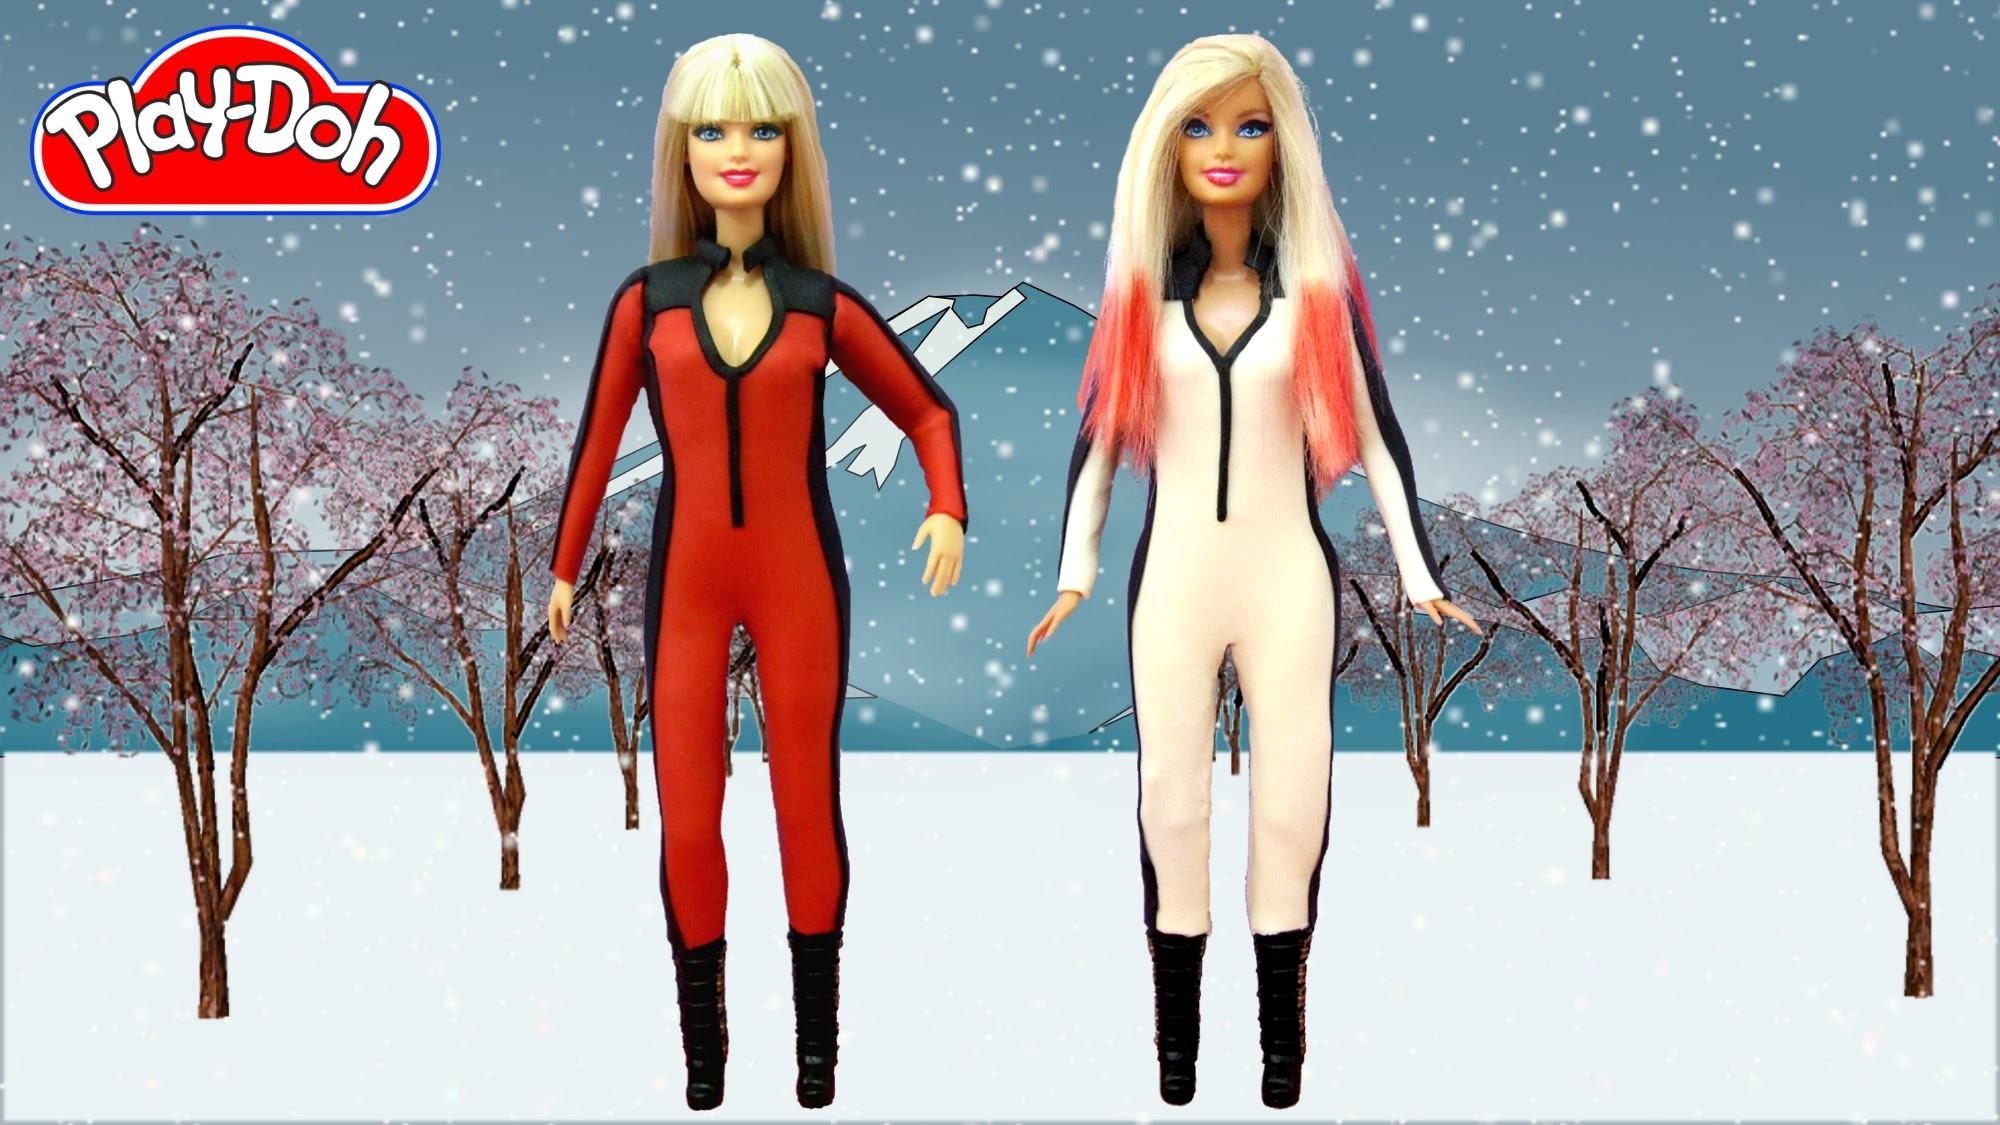 Play Doh Barbie Dolls Costume Iggy Azalea - Black Widow ft. Rita Ora Makeover Play-Doh Craft N Toys